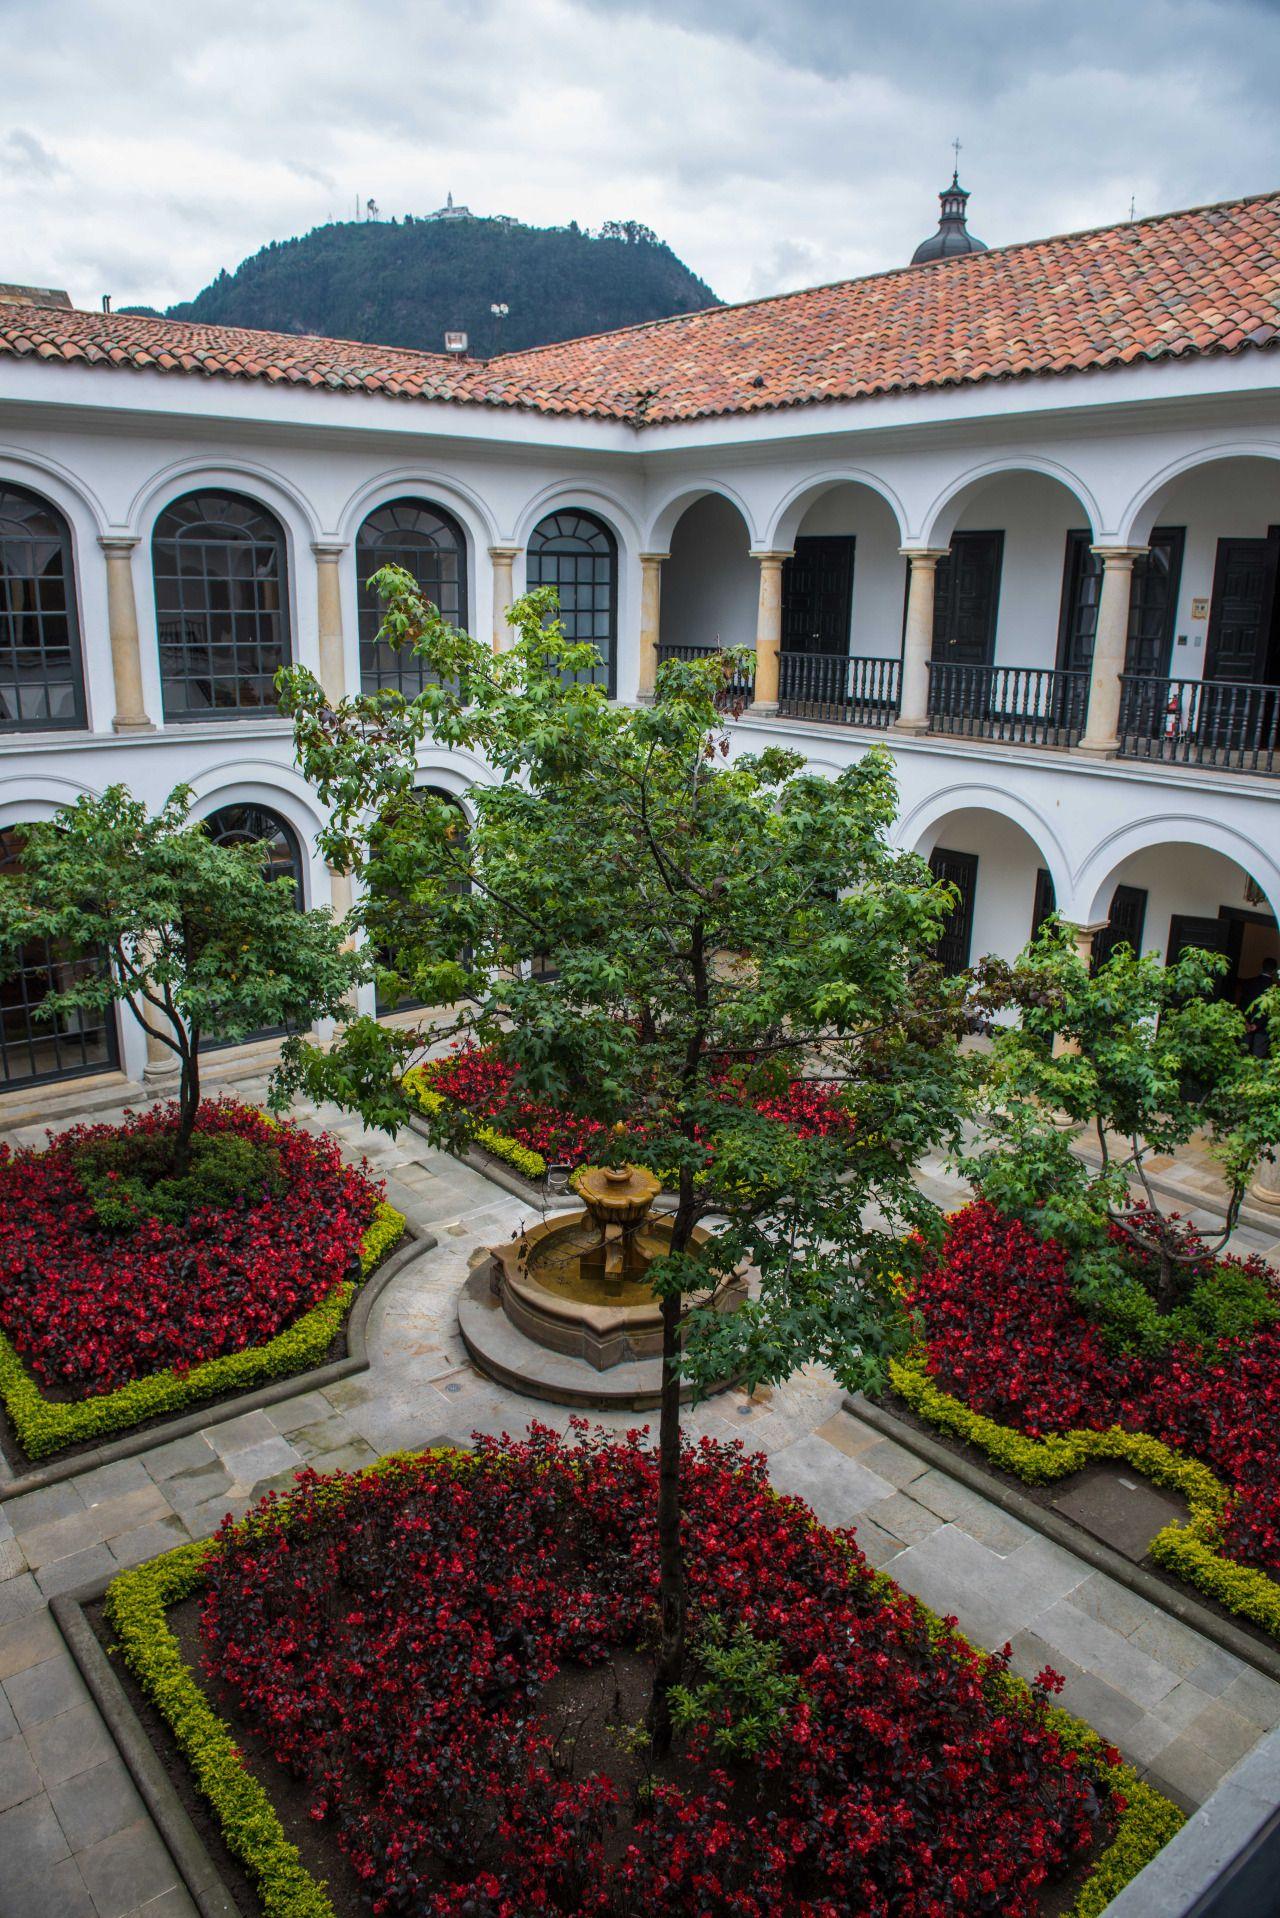 Casa de botero bogot colombia colombia pinterest for Casa mansion bogota